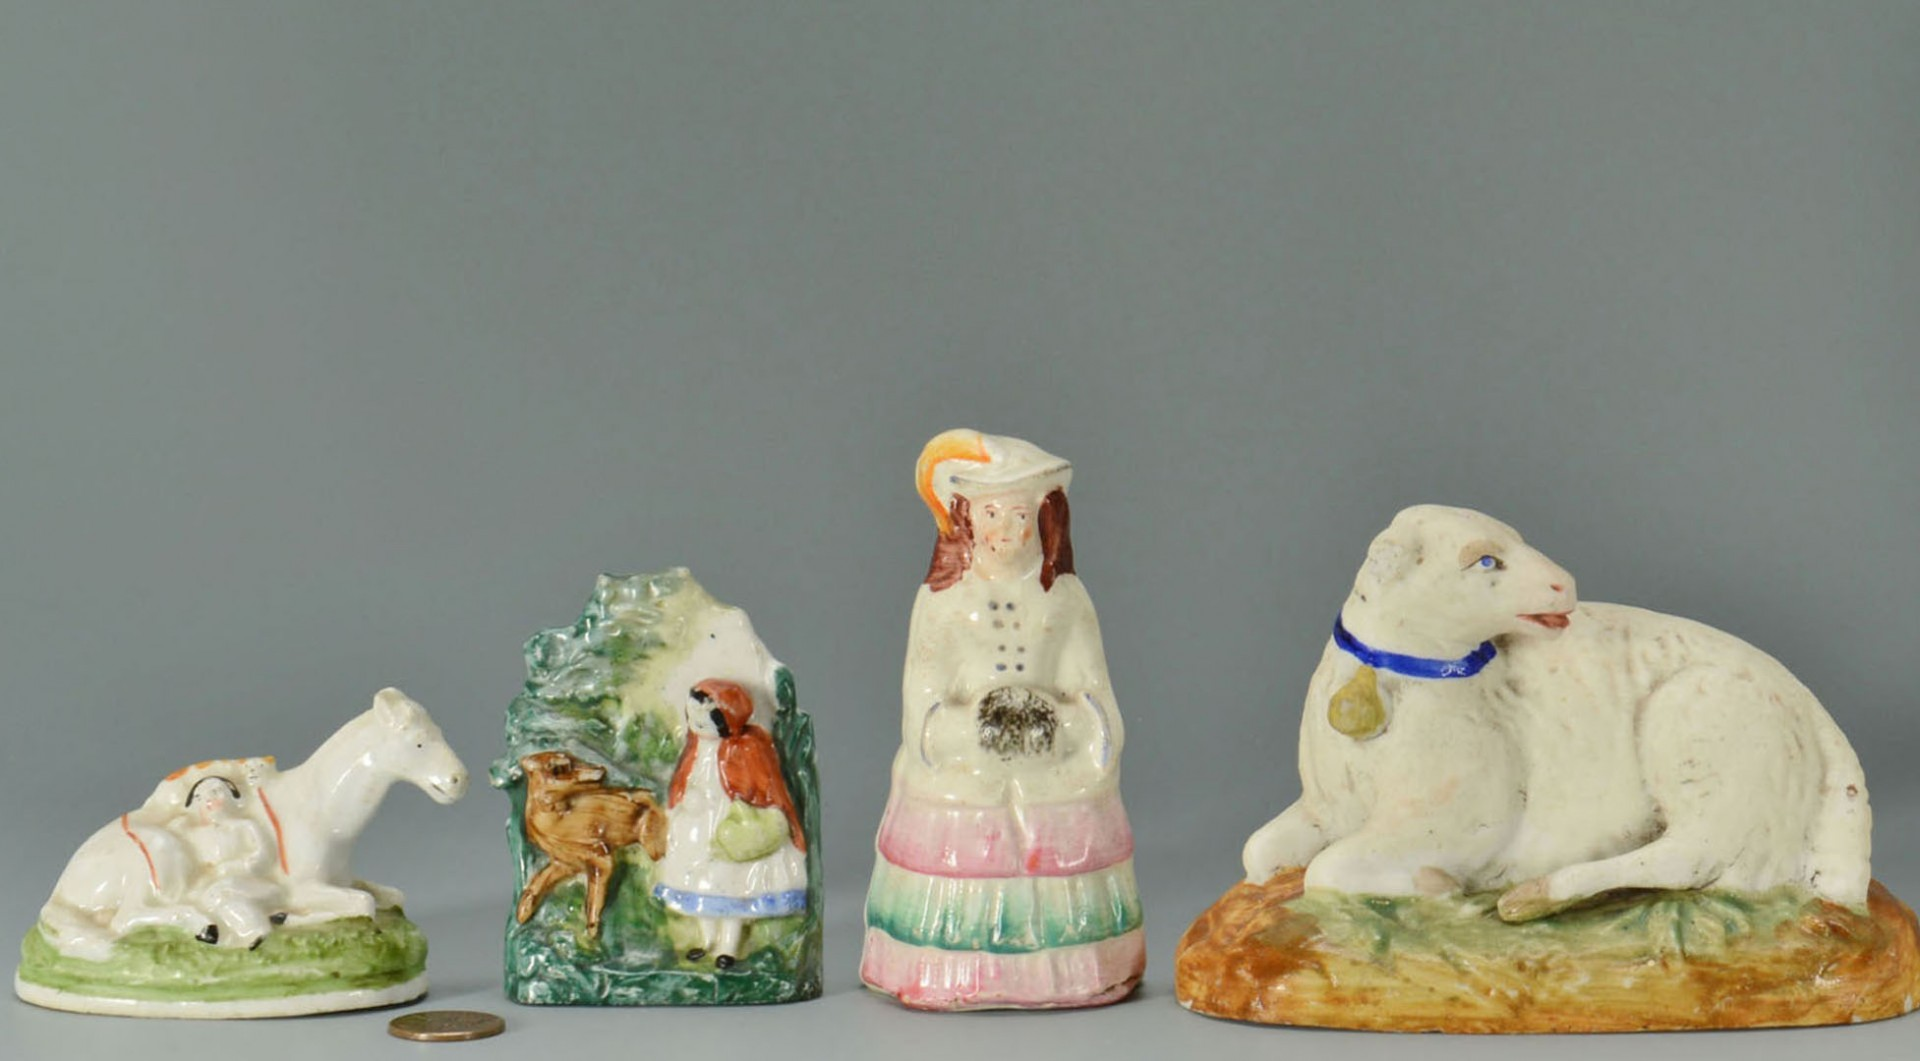 Lot 2872330: English Staffordshire Animals & Figurals, 6